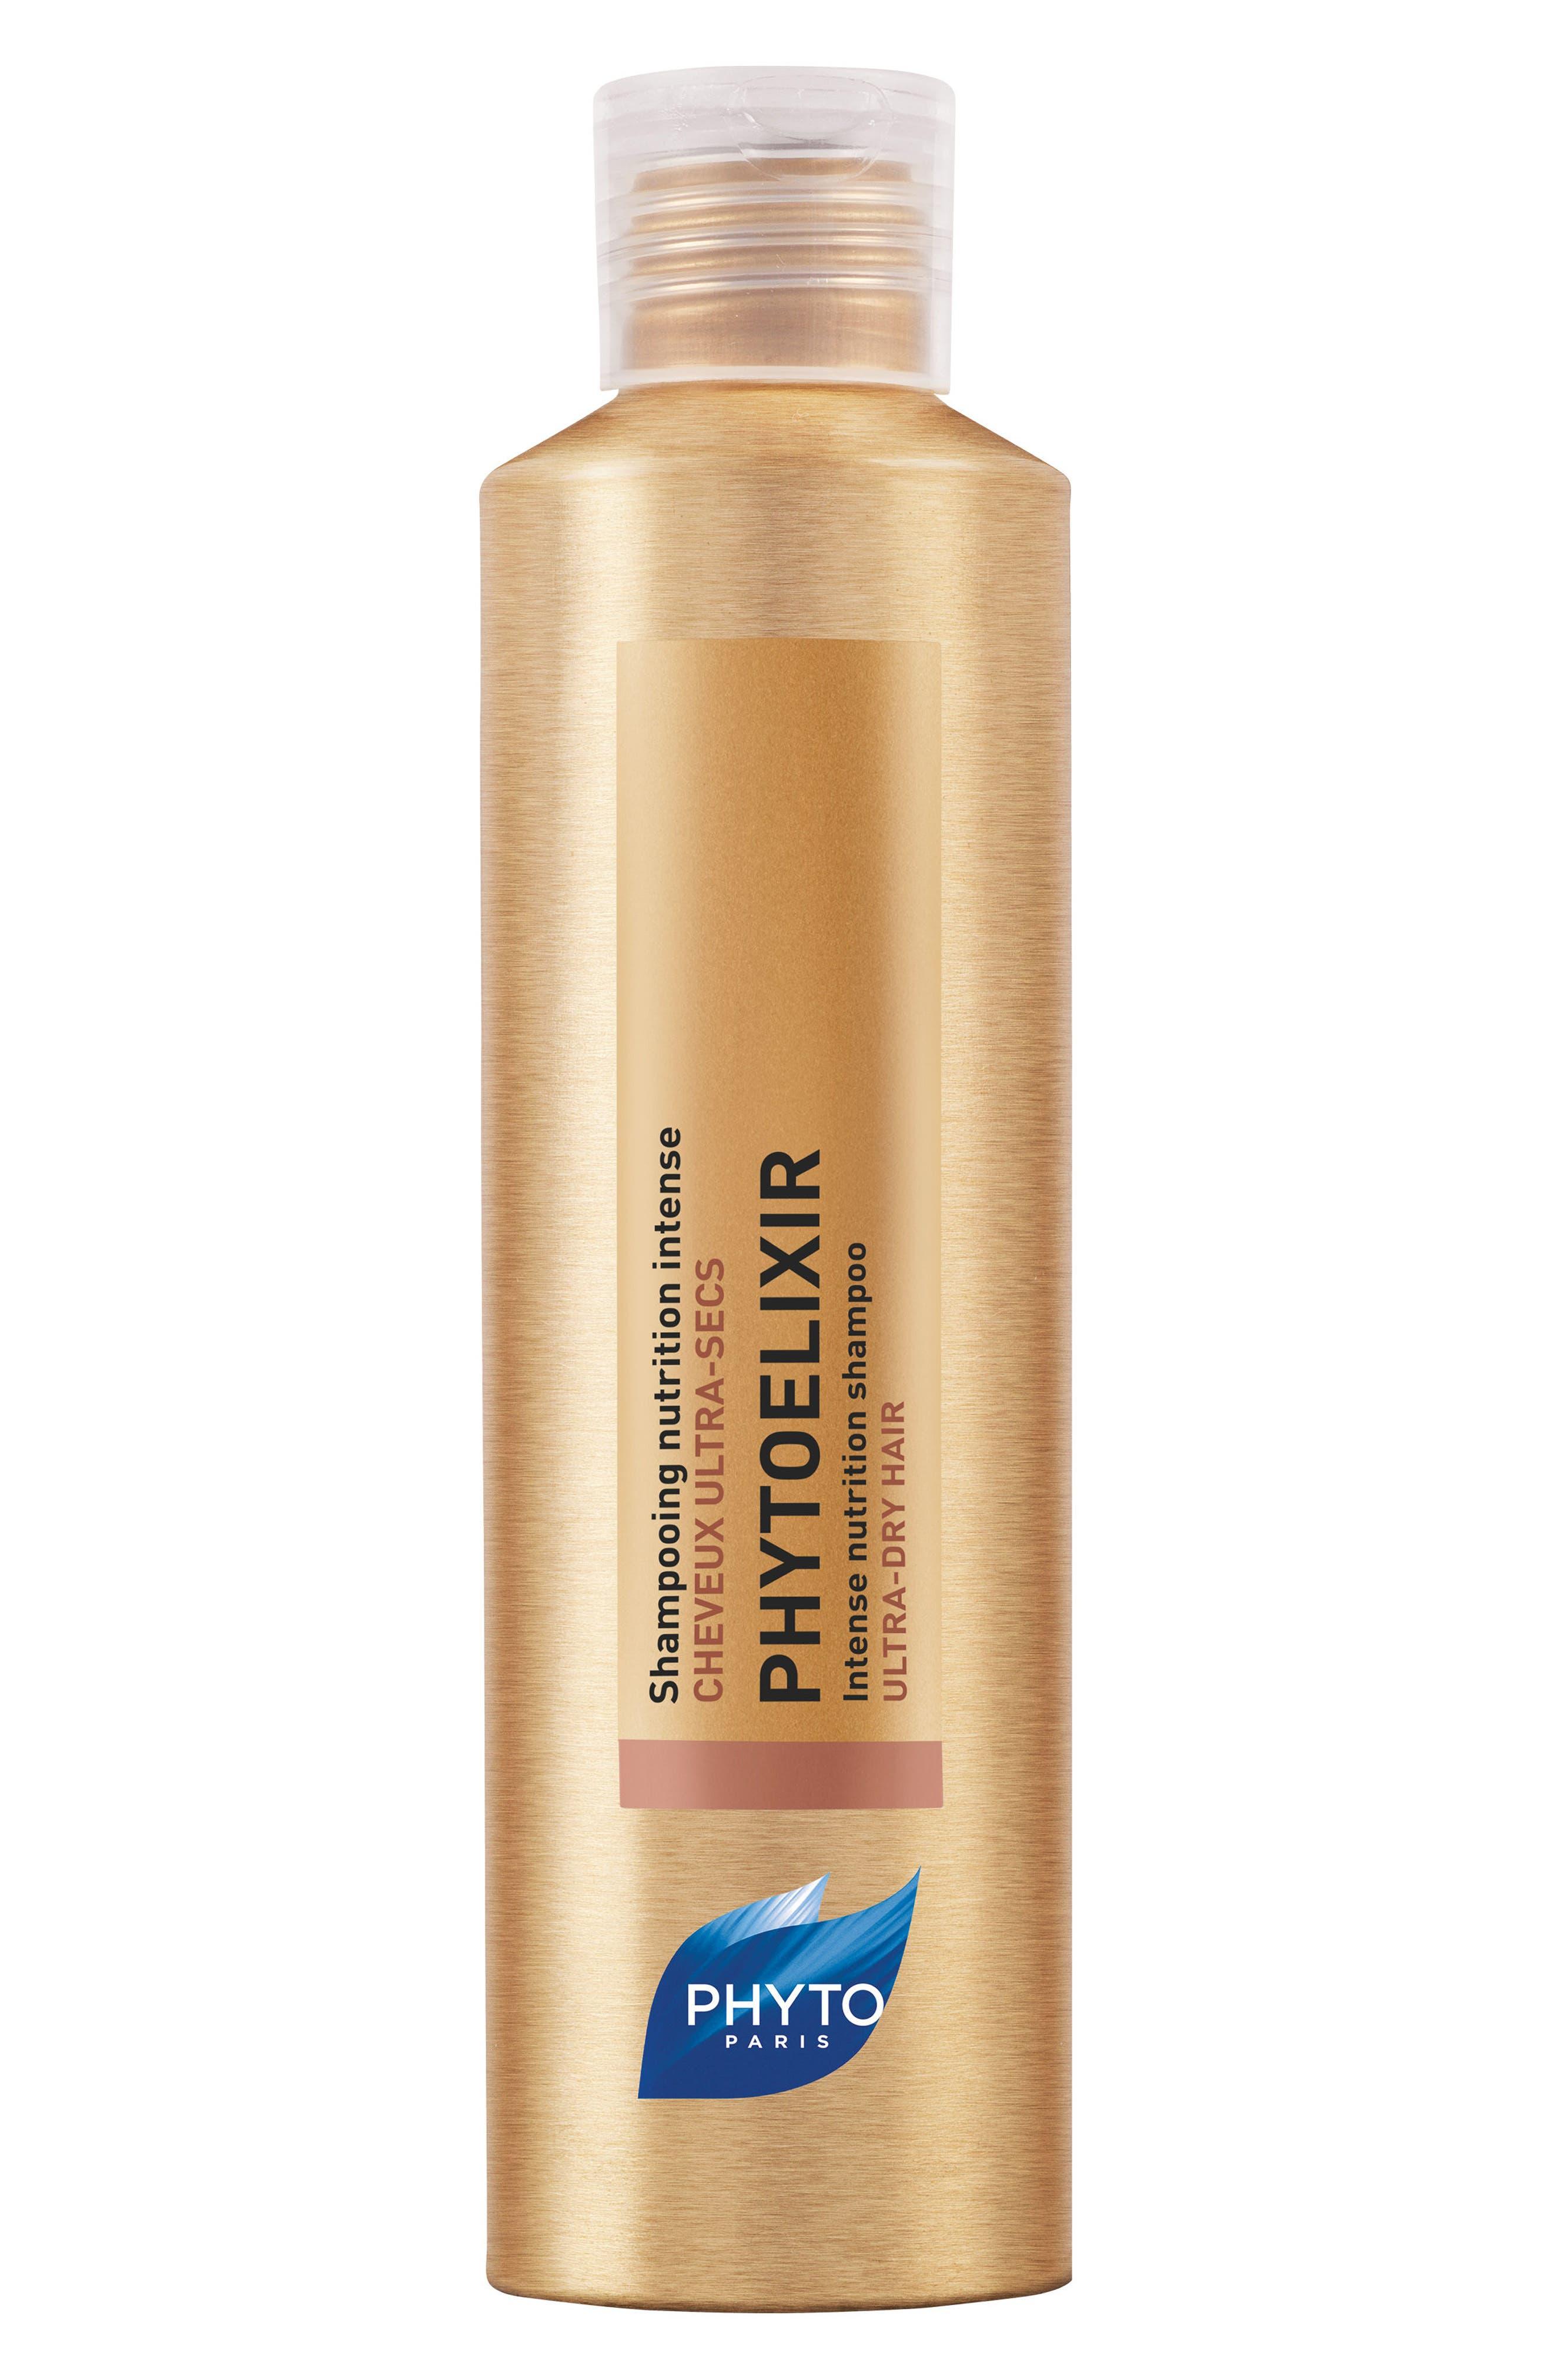 PHYTO Phytoelixir Intense Nutrition Shampoo